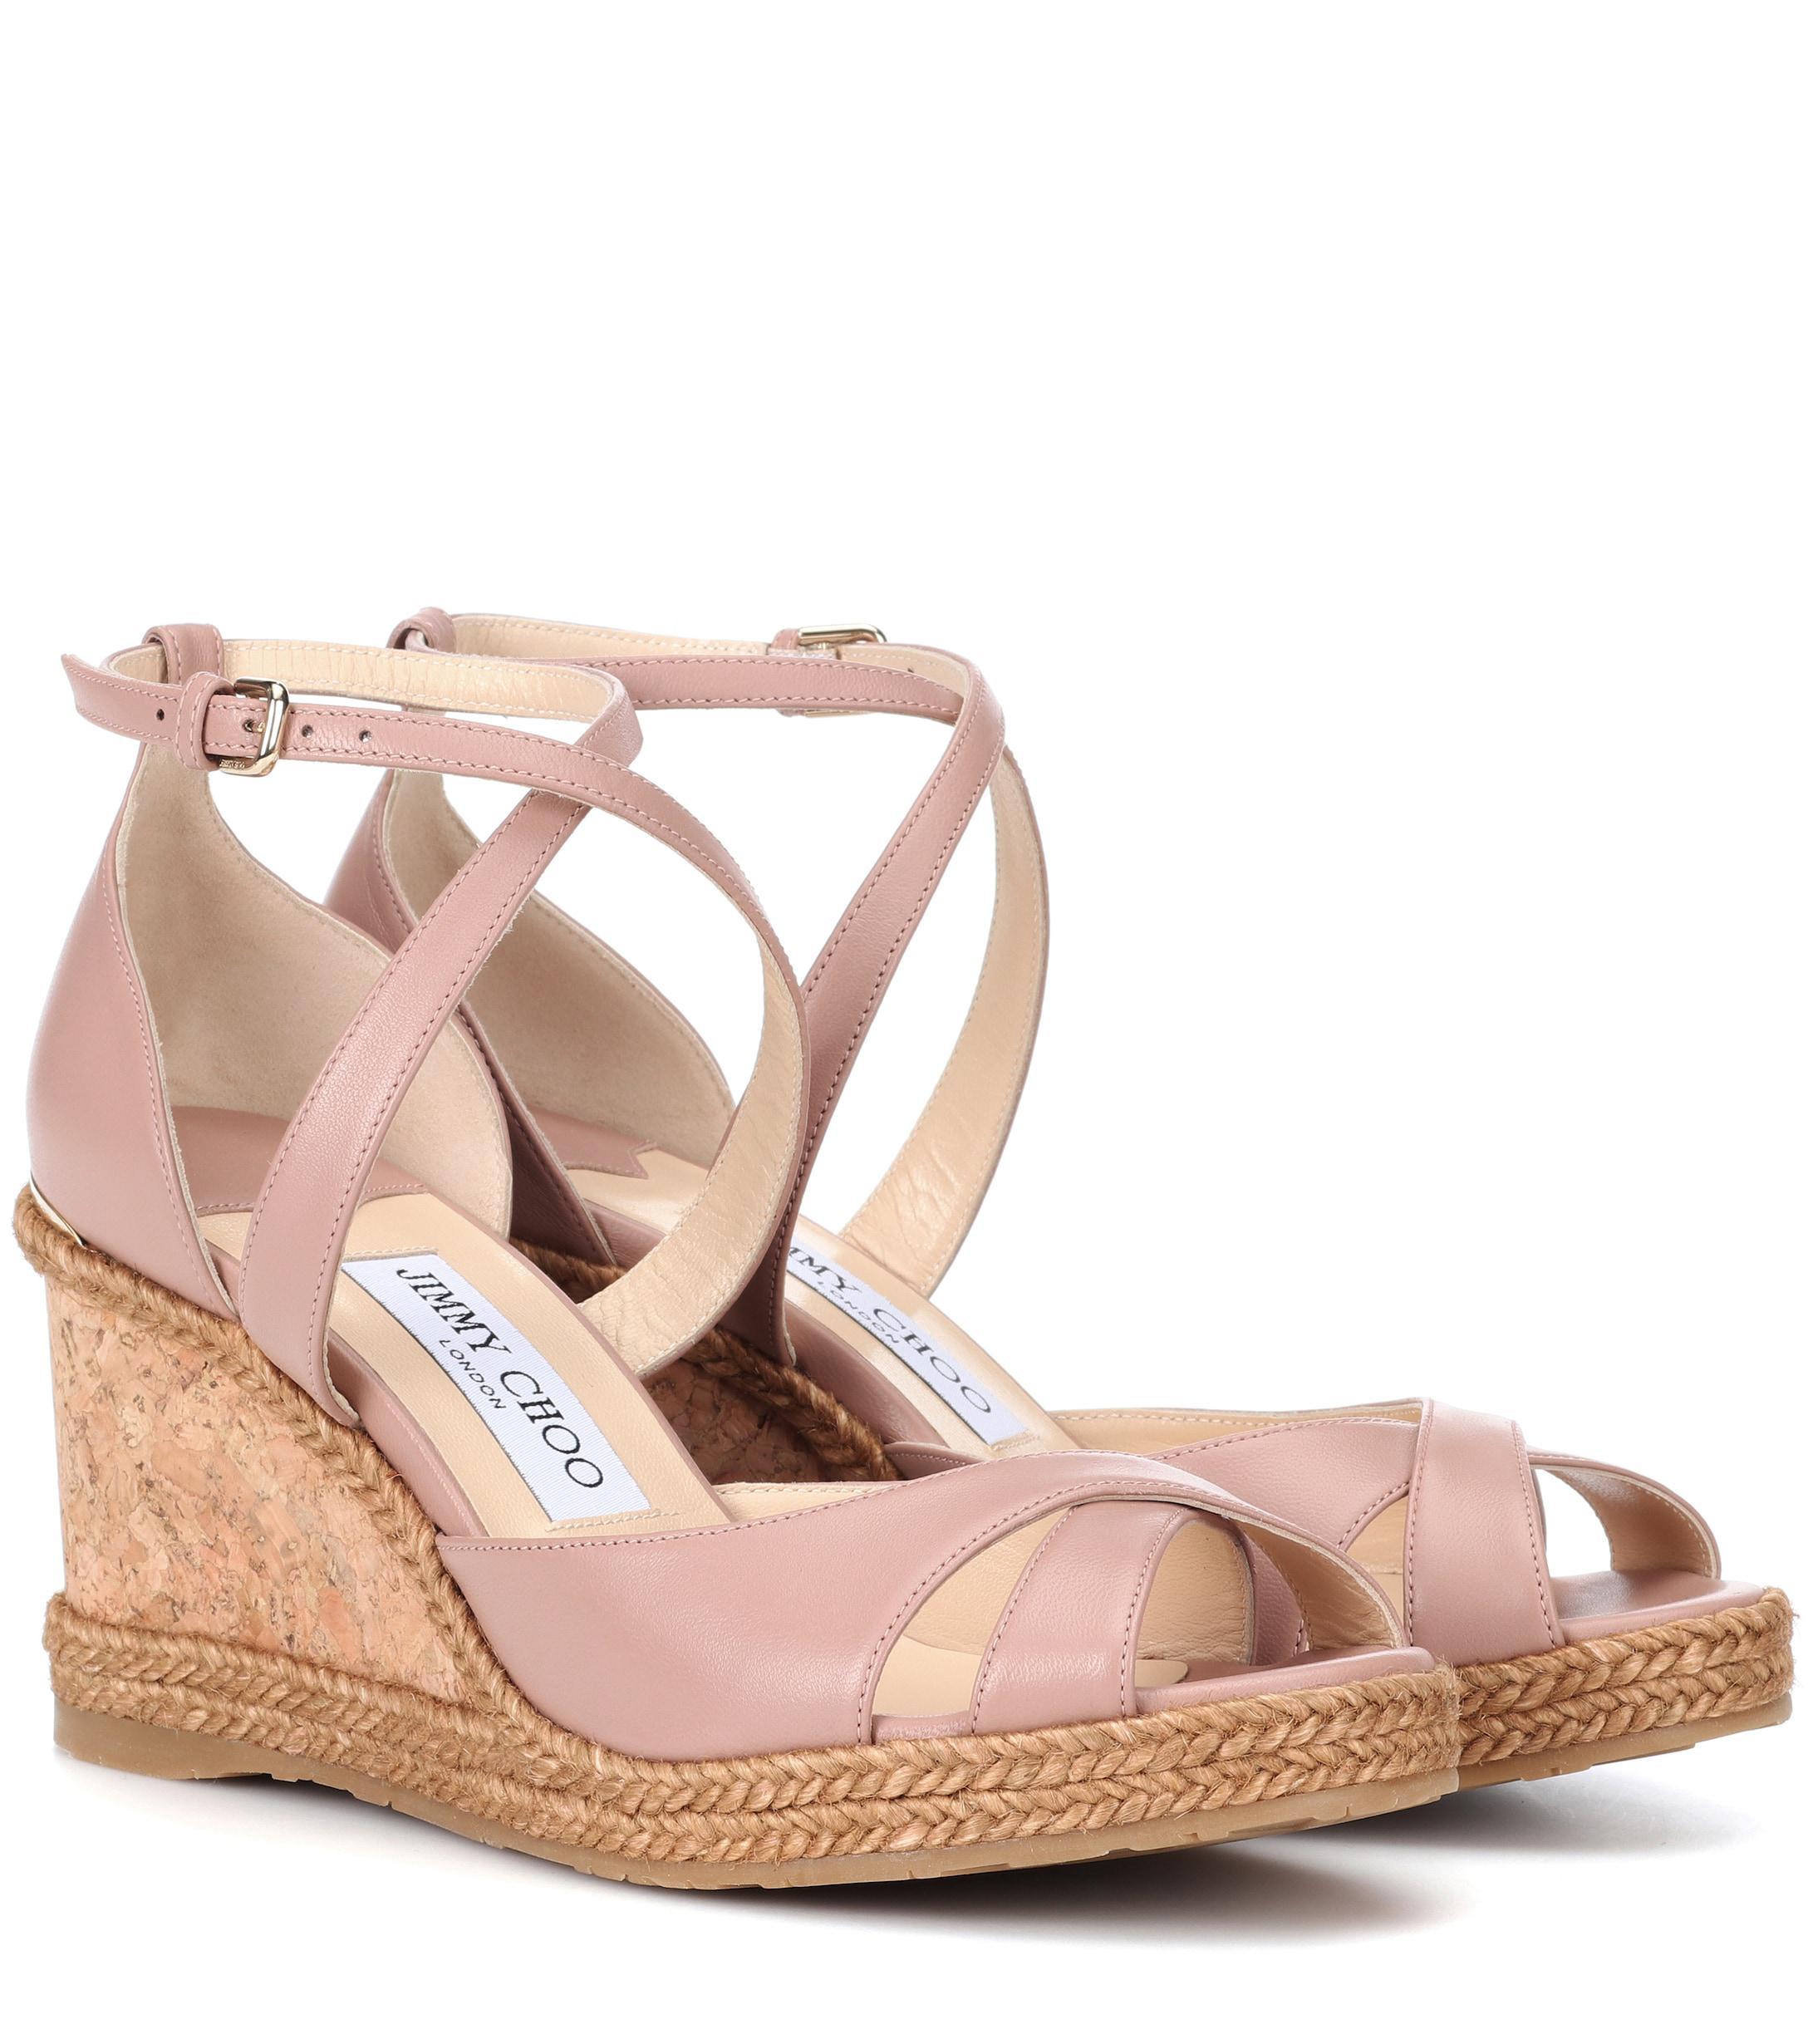 ec580851f74c Jimmy Choo - Pink Alanah 80 Leather Wedge Sandals - Lyst. View fullscreen